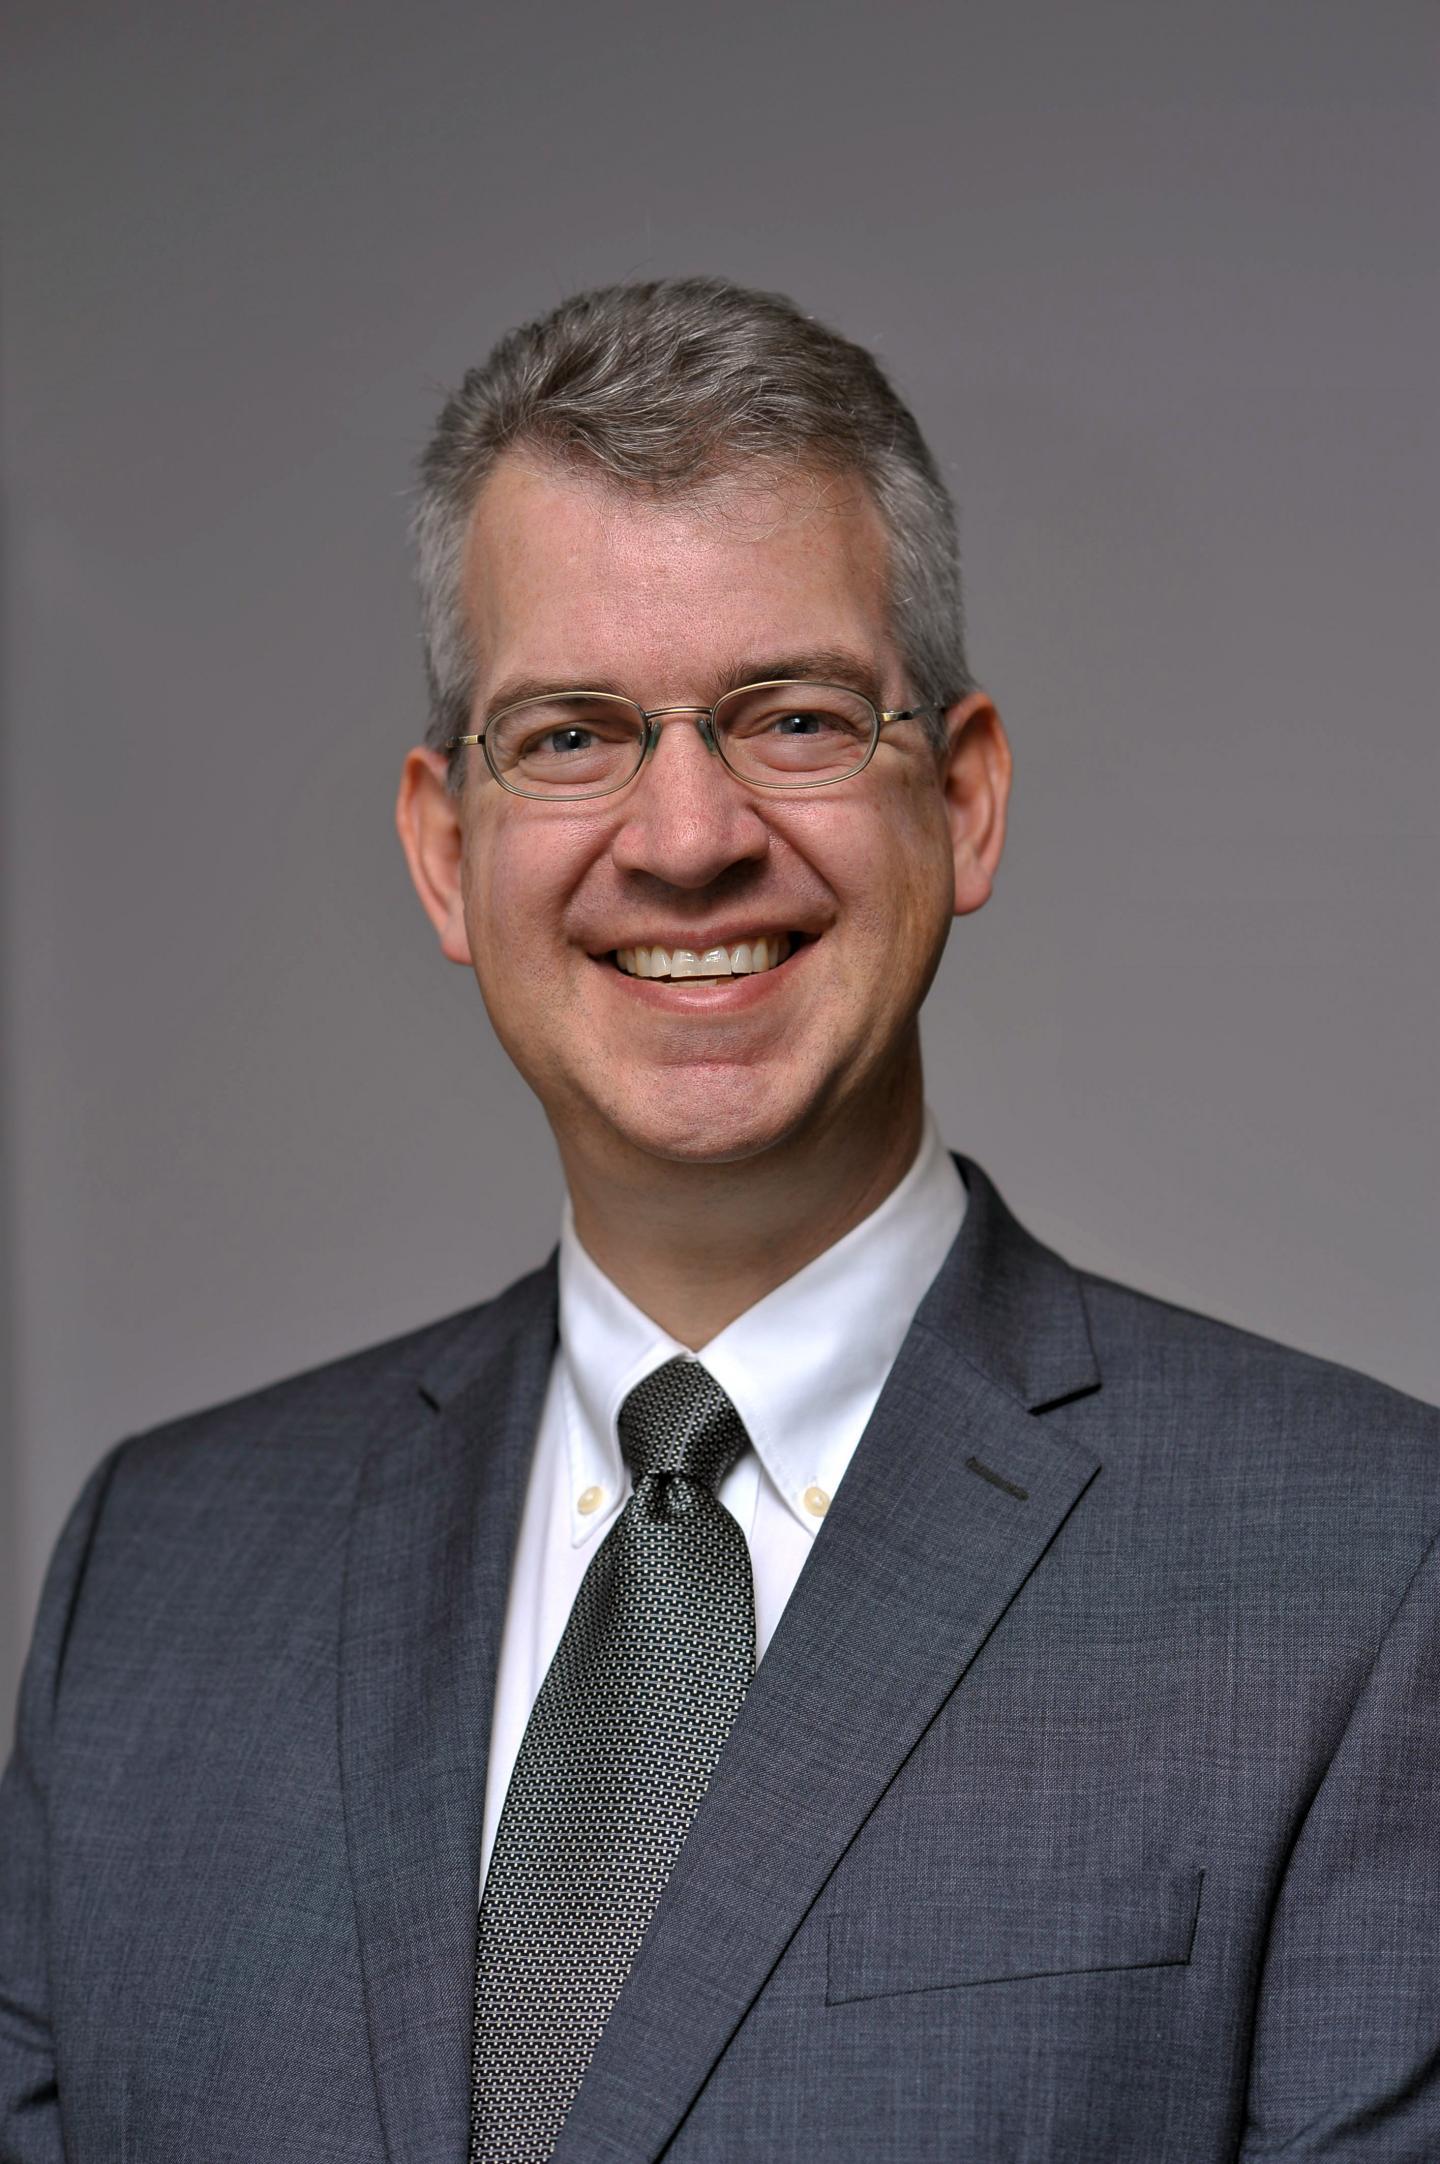 David G. Enos, DOE/Sandia National Laboratories